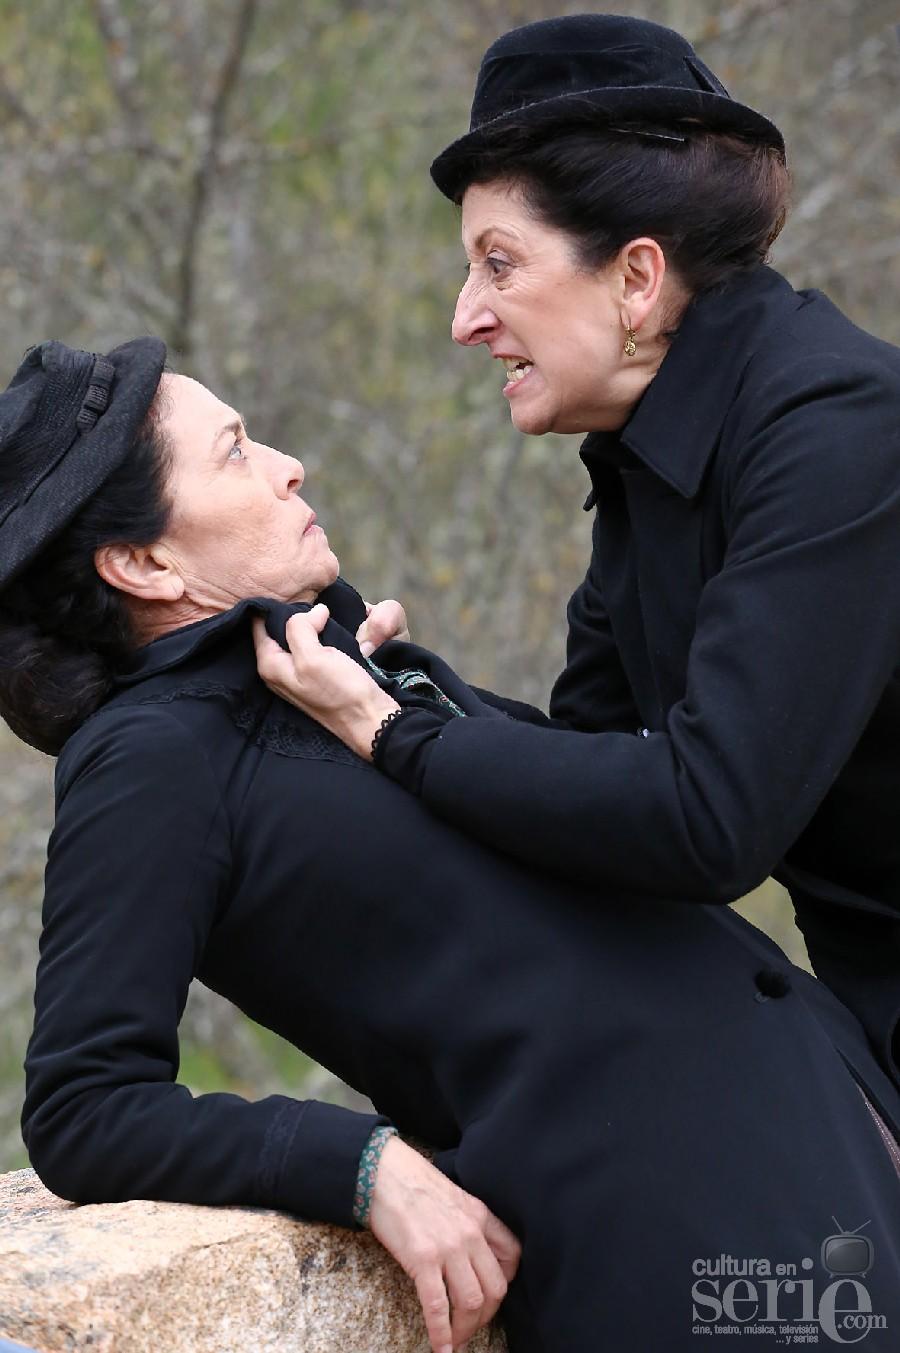 Ursula y Fabiana